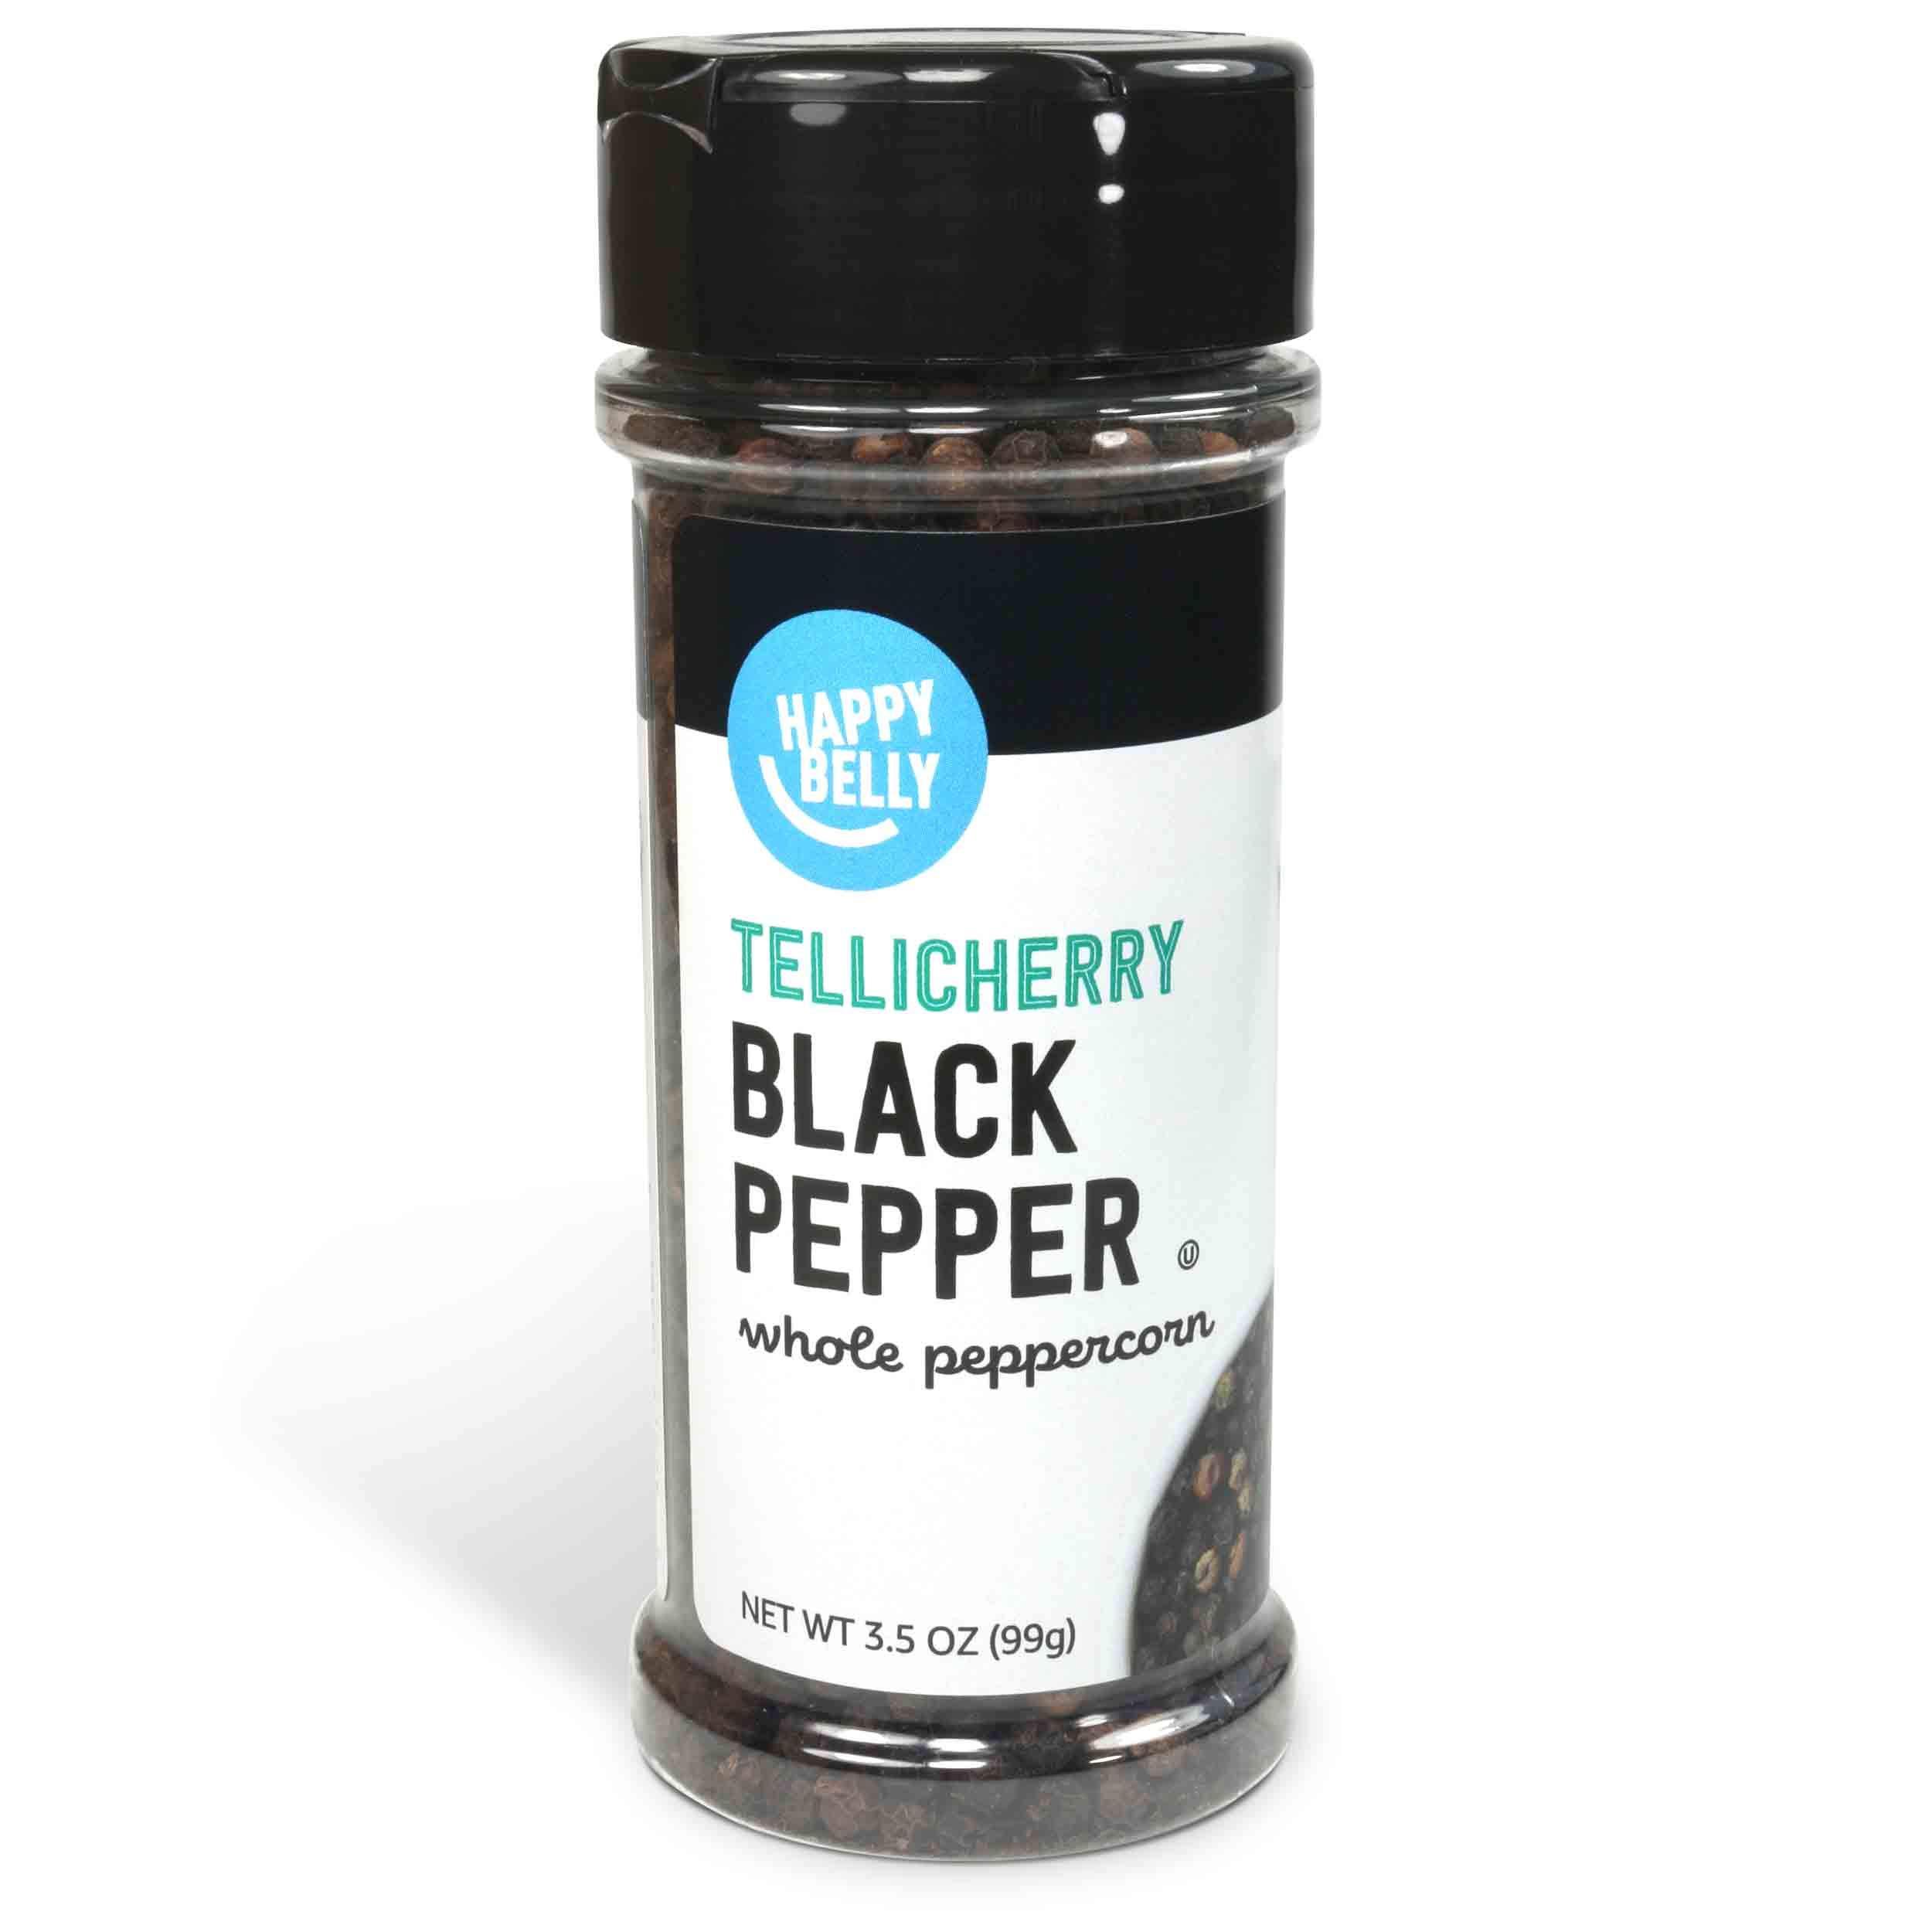 Amazon Brand - Happy Belly Tellicherry Black Pepper, Whole Peppercorn, 3.5 Ounces